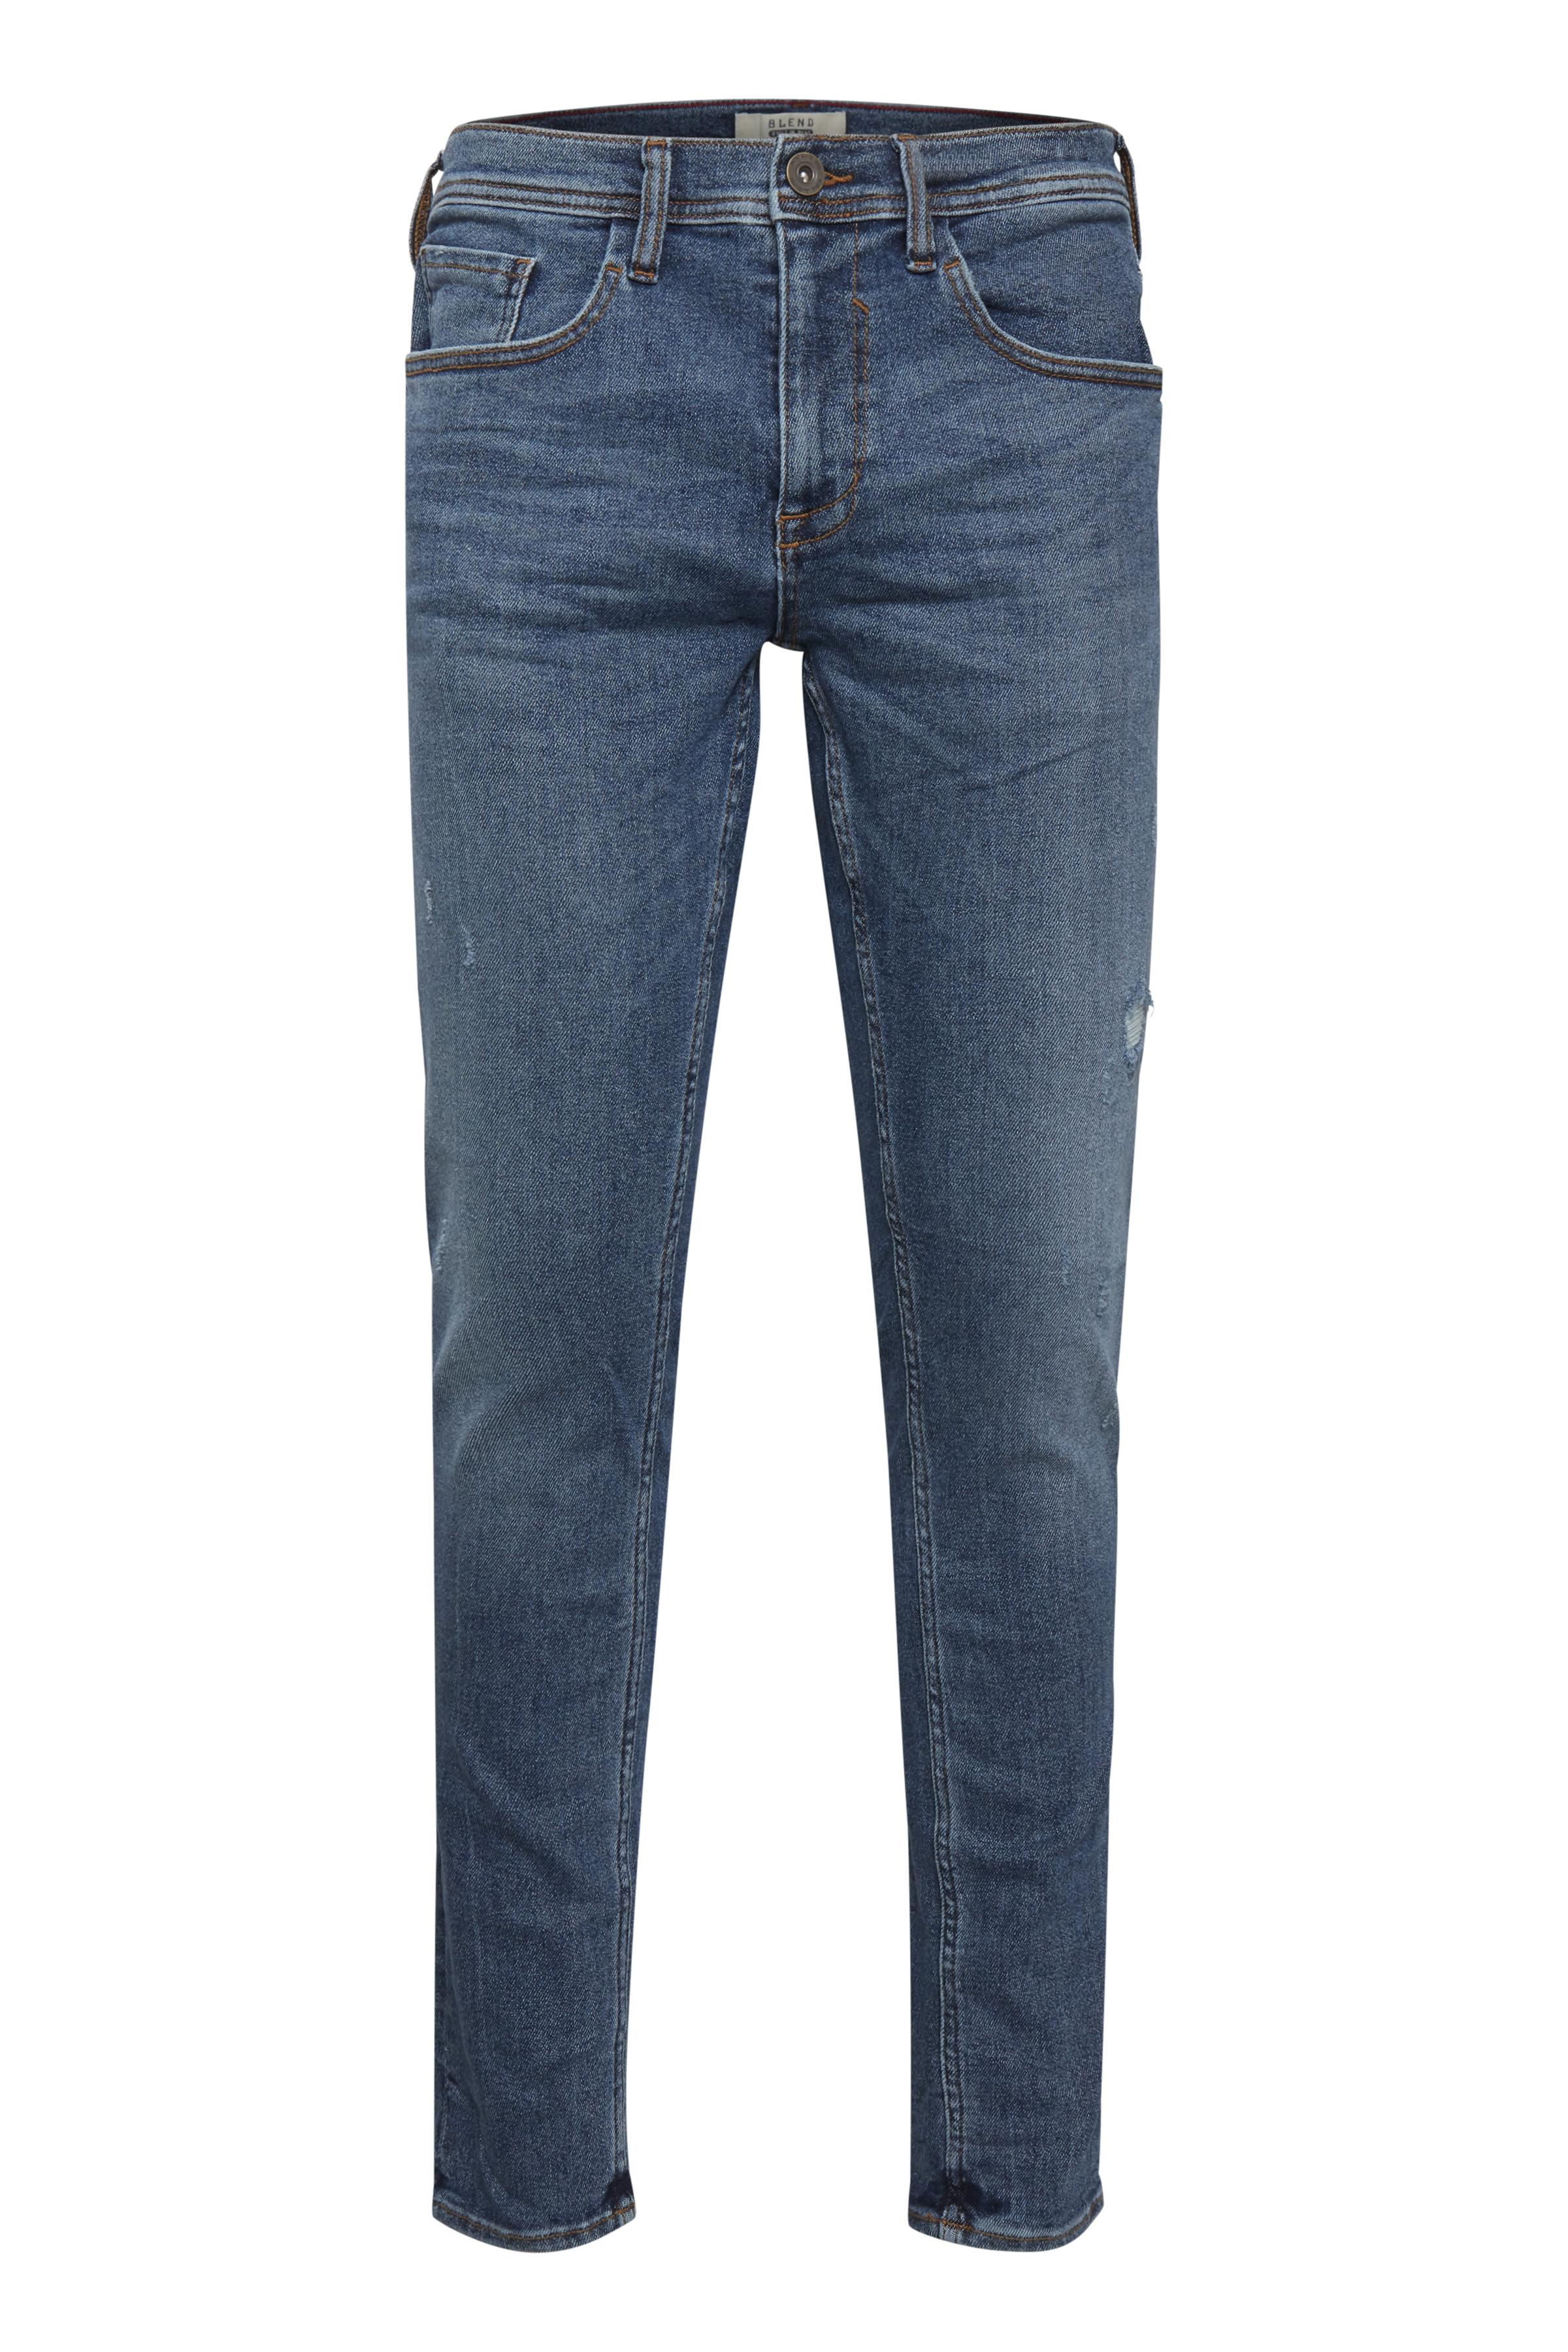 Image of Blend He Herre Jeans - Denim Middleblue